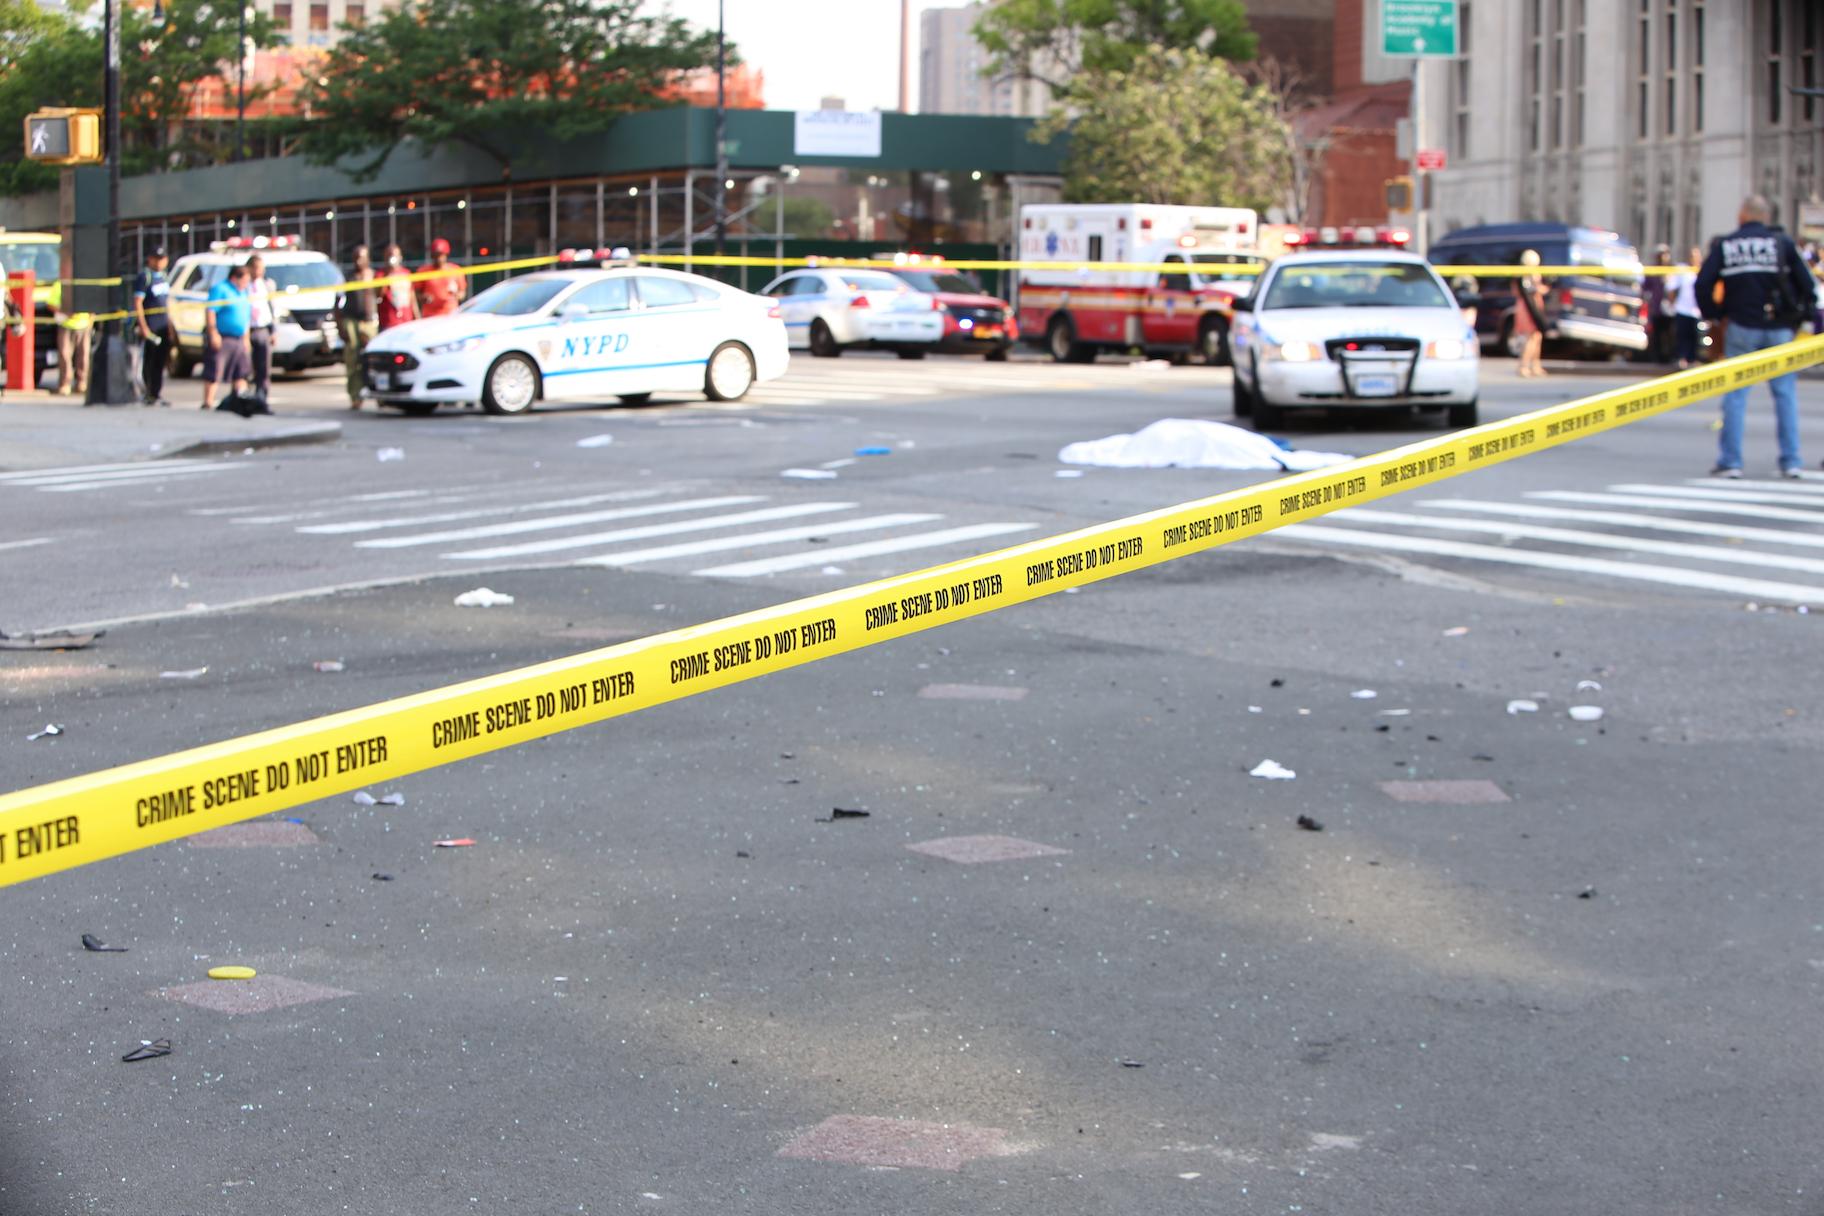 hit and run accident scene